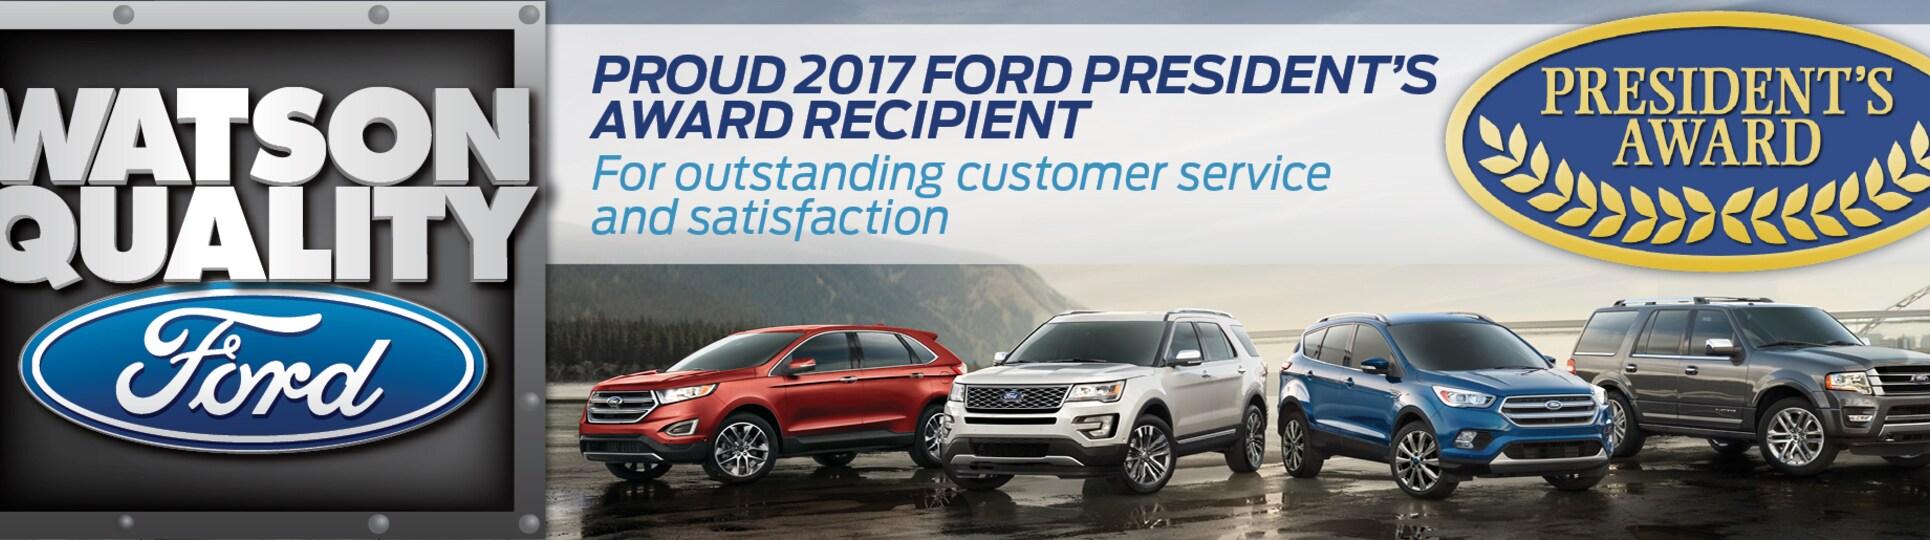 Jackson Watson Quality Ford Inc New Used Cars Ridgeland Ms Car Starter Motor I